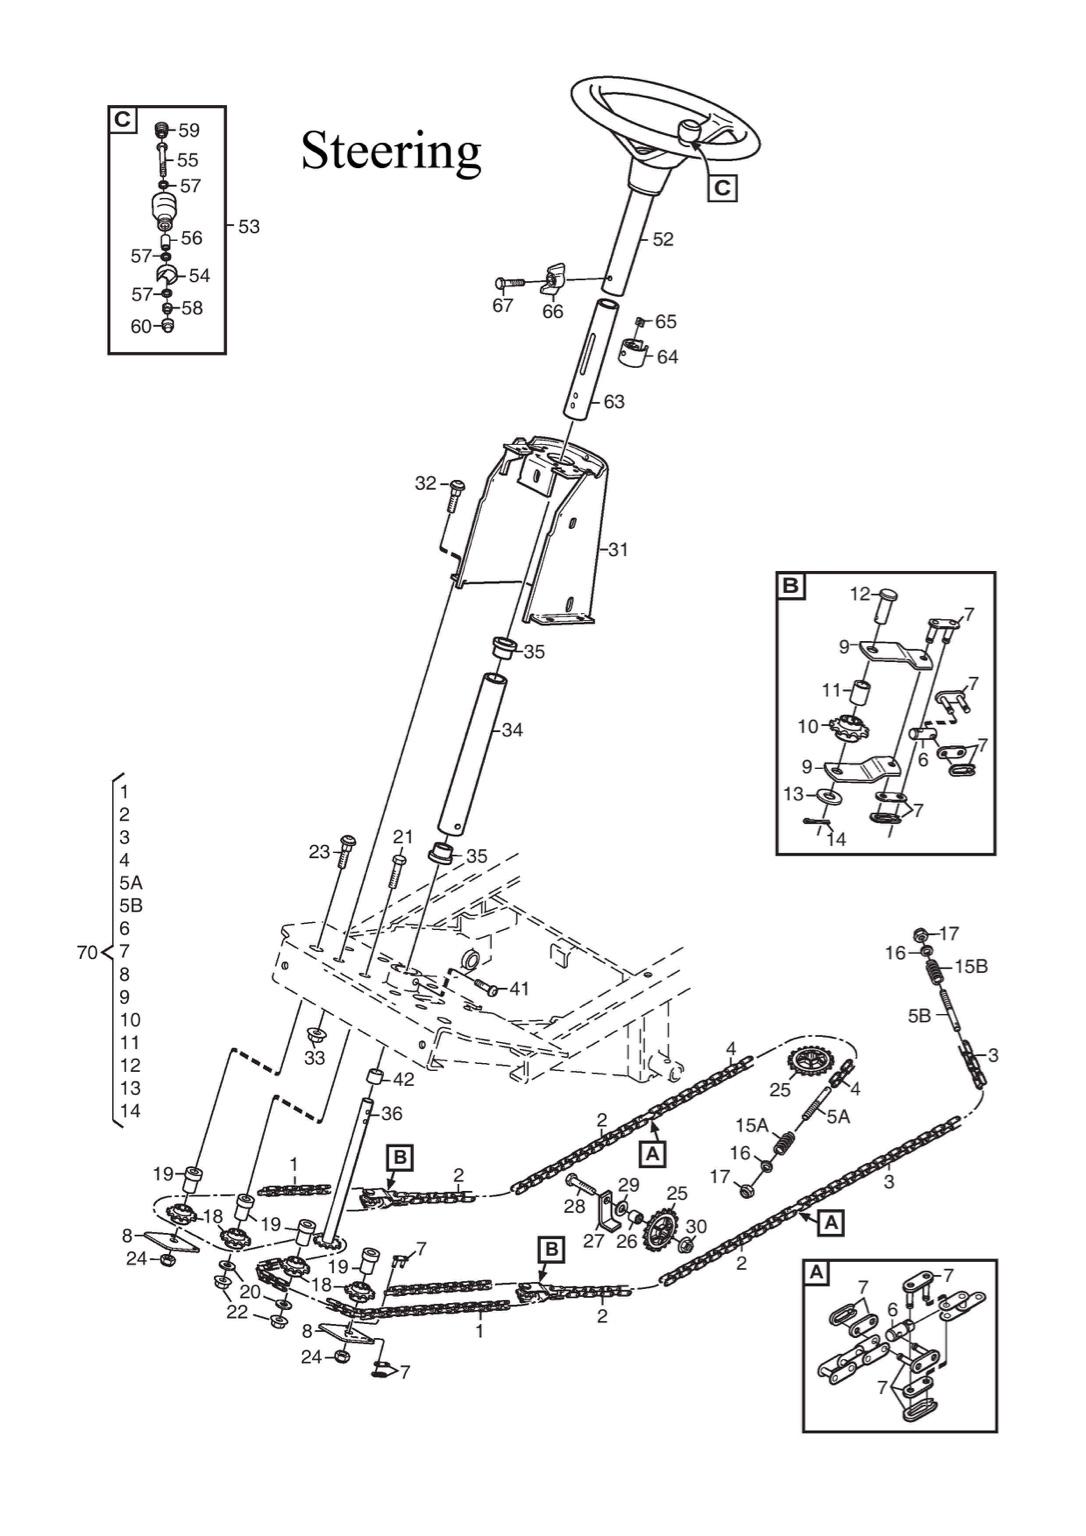 52 Cadillac Wiring Diagram Auto Electrical Citroen Vacuum Eftermontera Servo P U00e5 Stiga Park U2022 Maskinisten